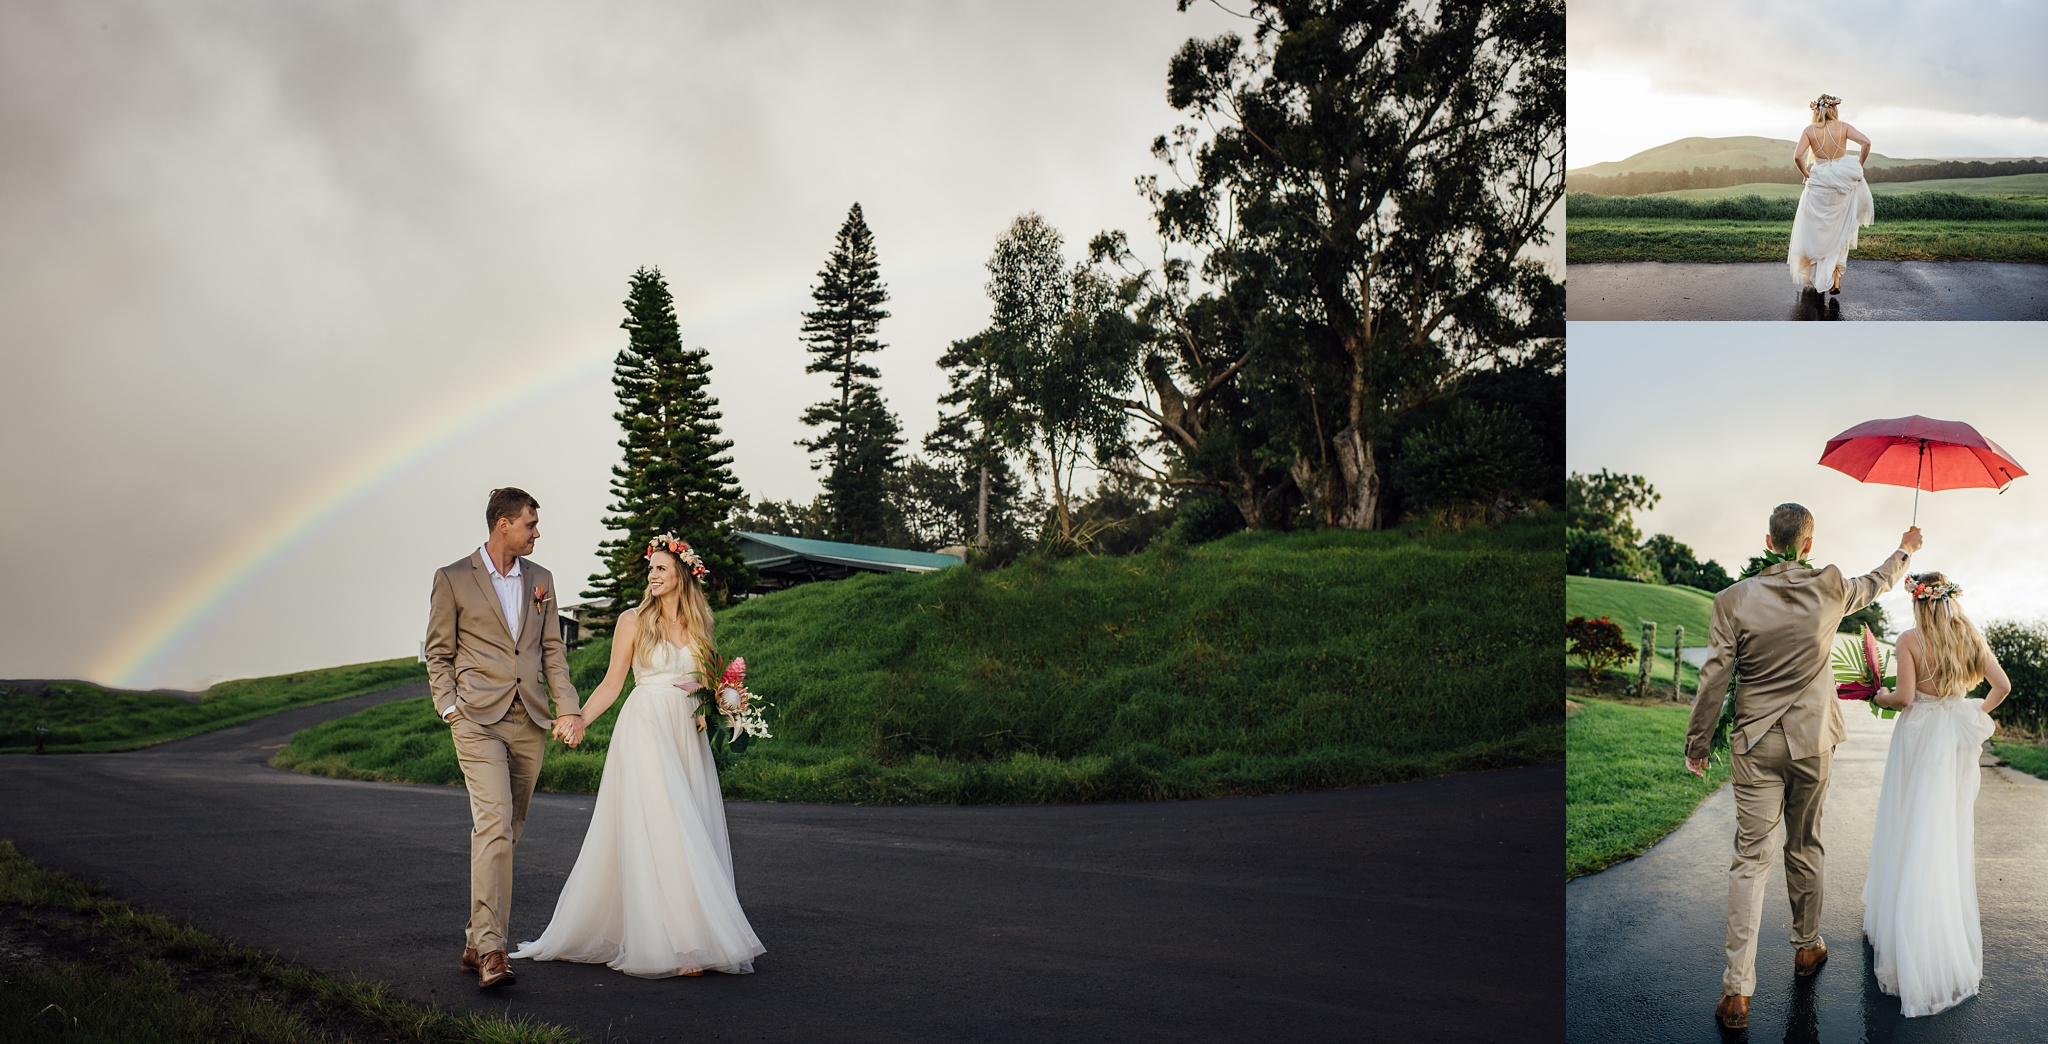 rainbow on a wedding day at kahua ranch on the big island